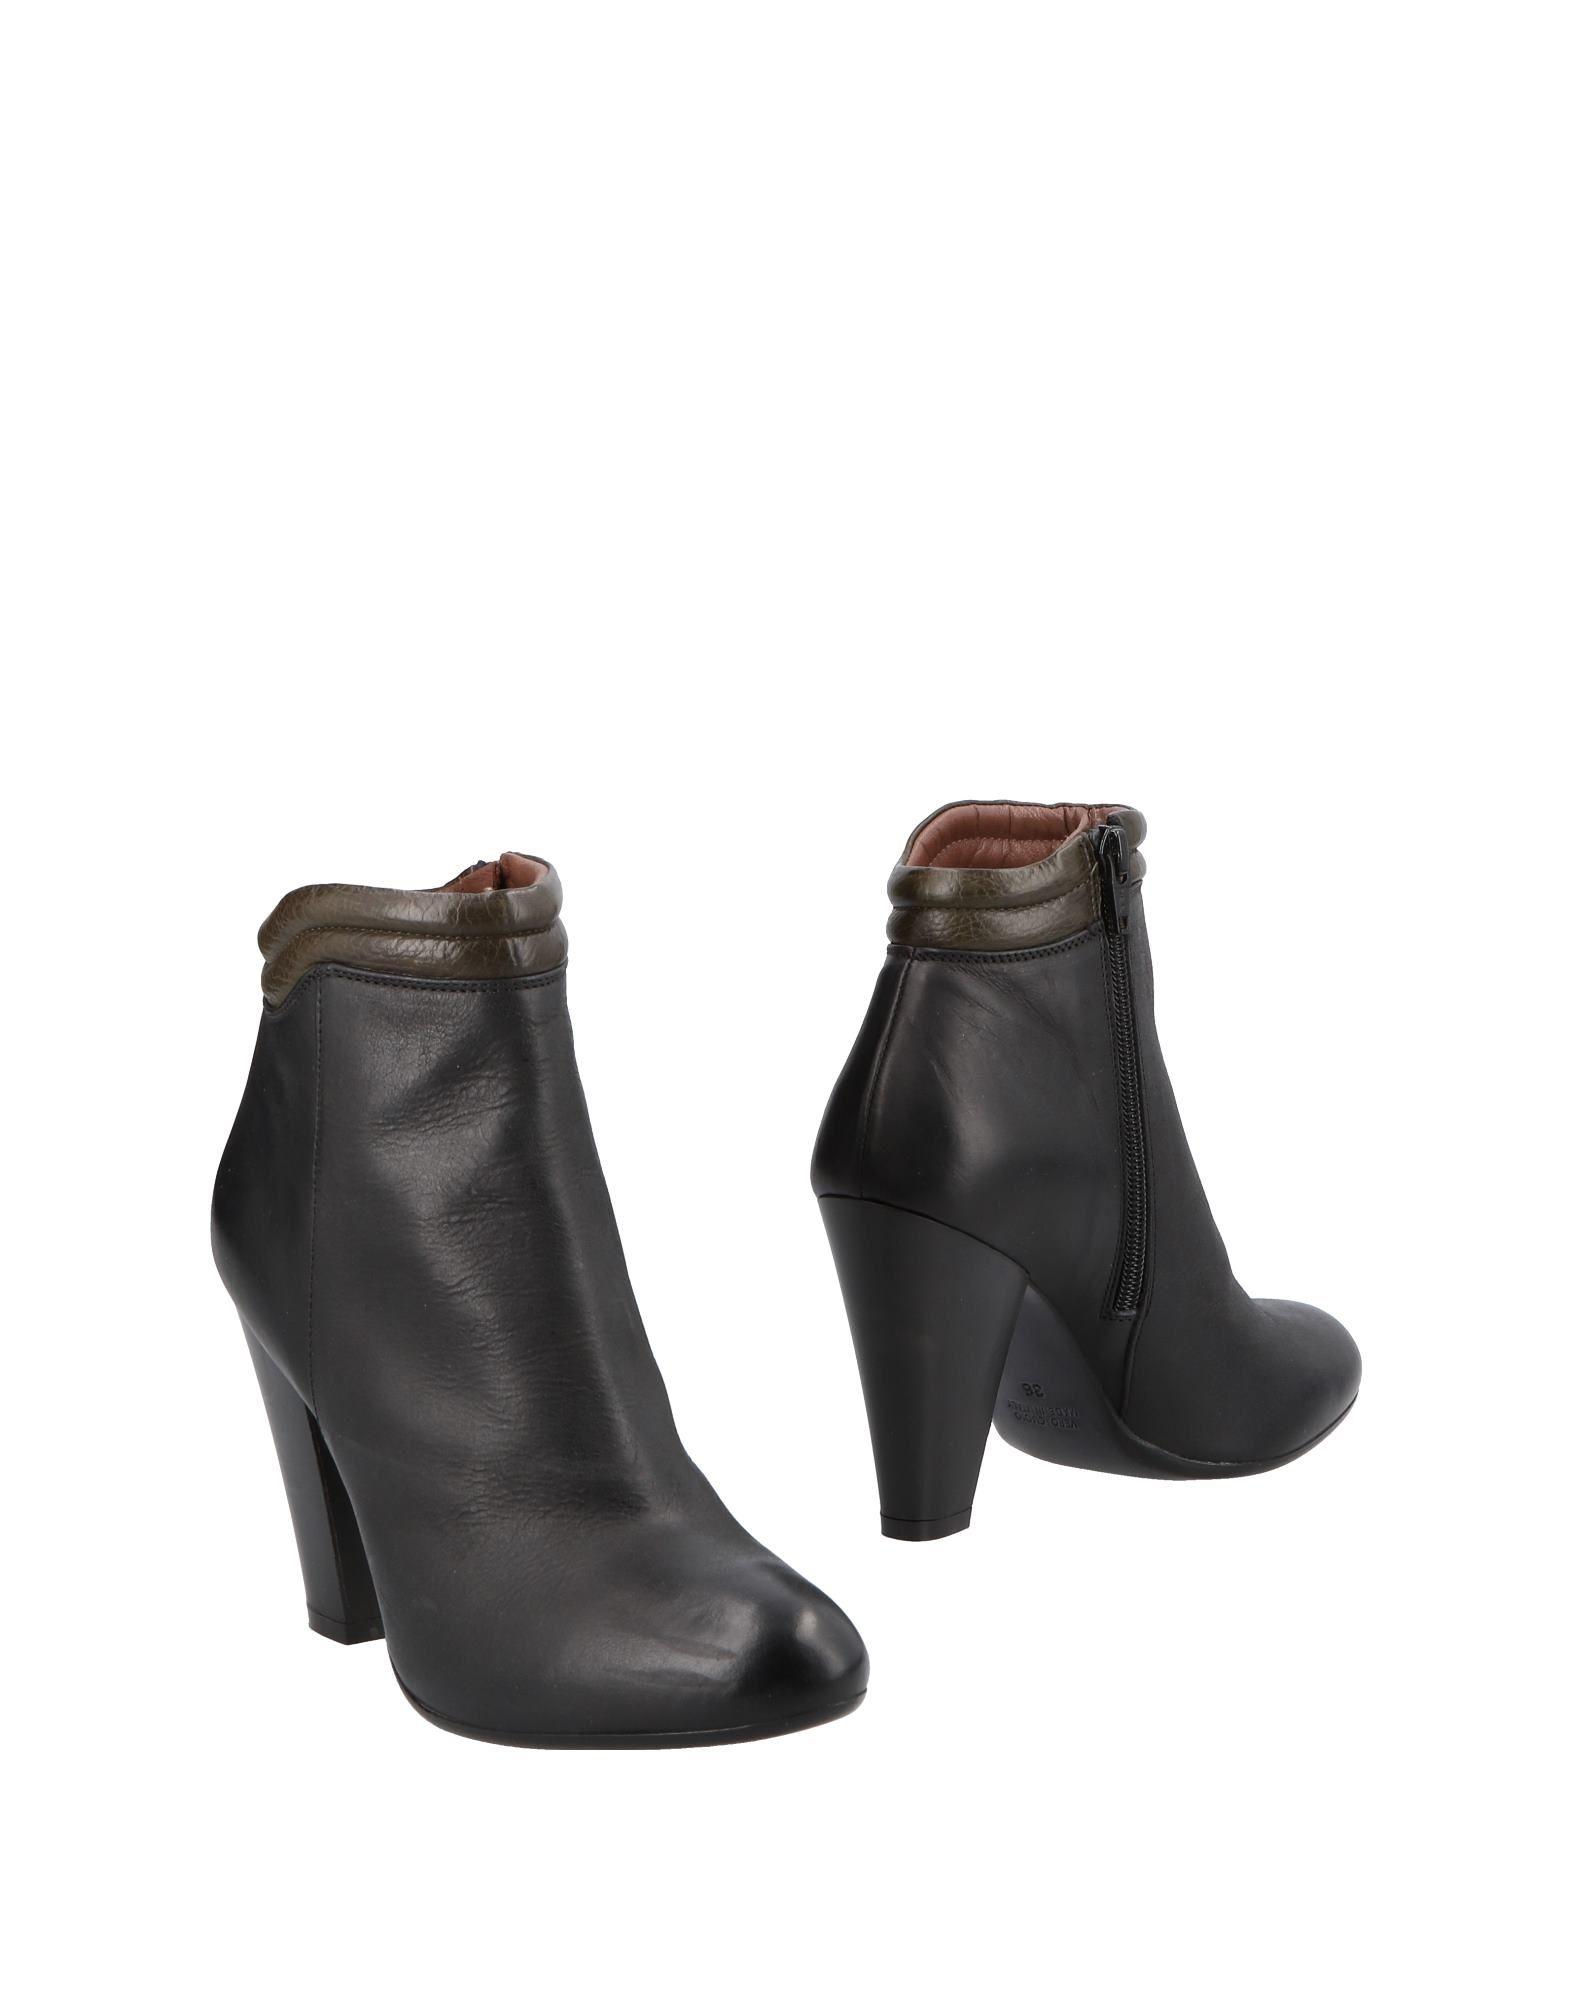 Fiorifrancesi Stiefelette Damen  11481328DI Gute Qualität beliebte Schuhe